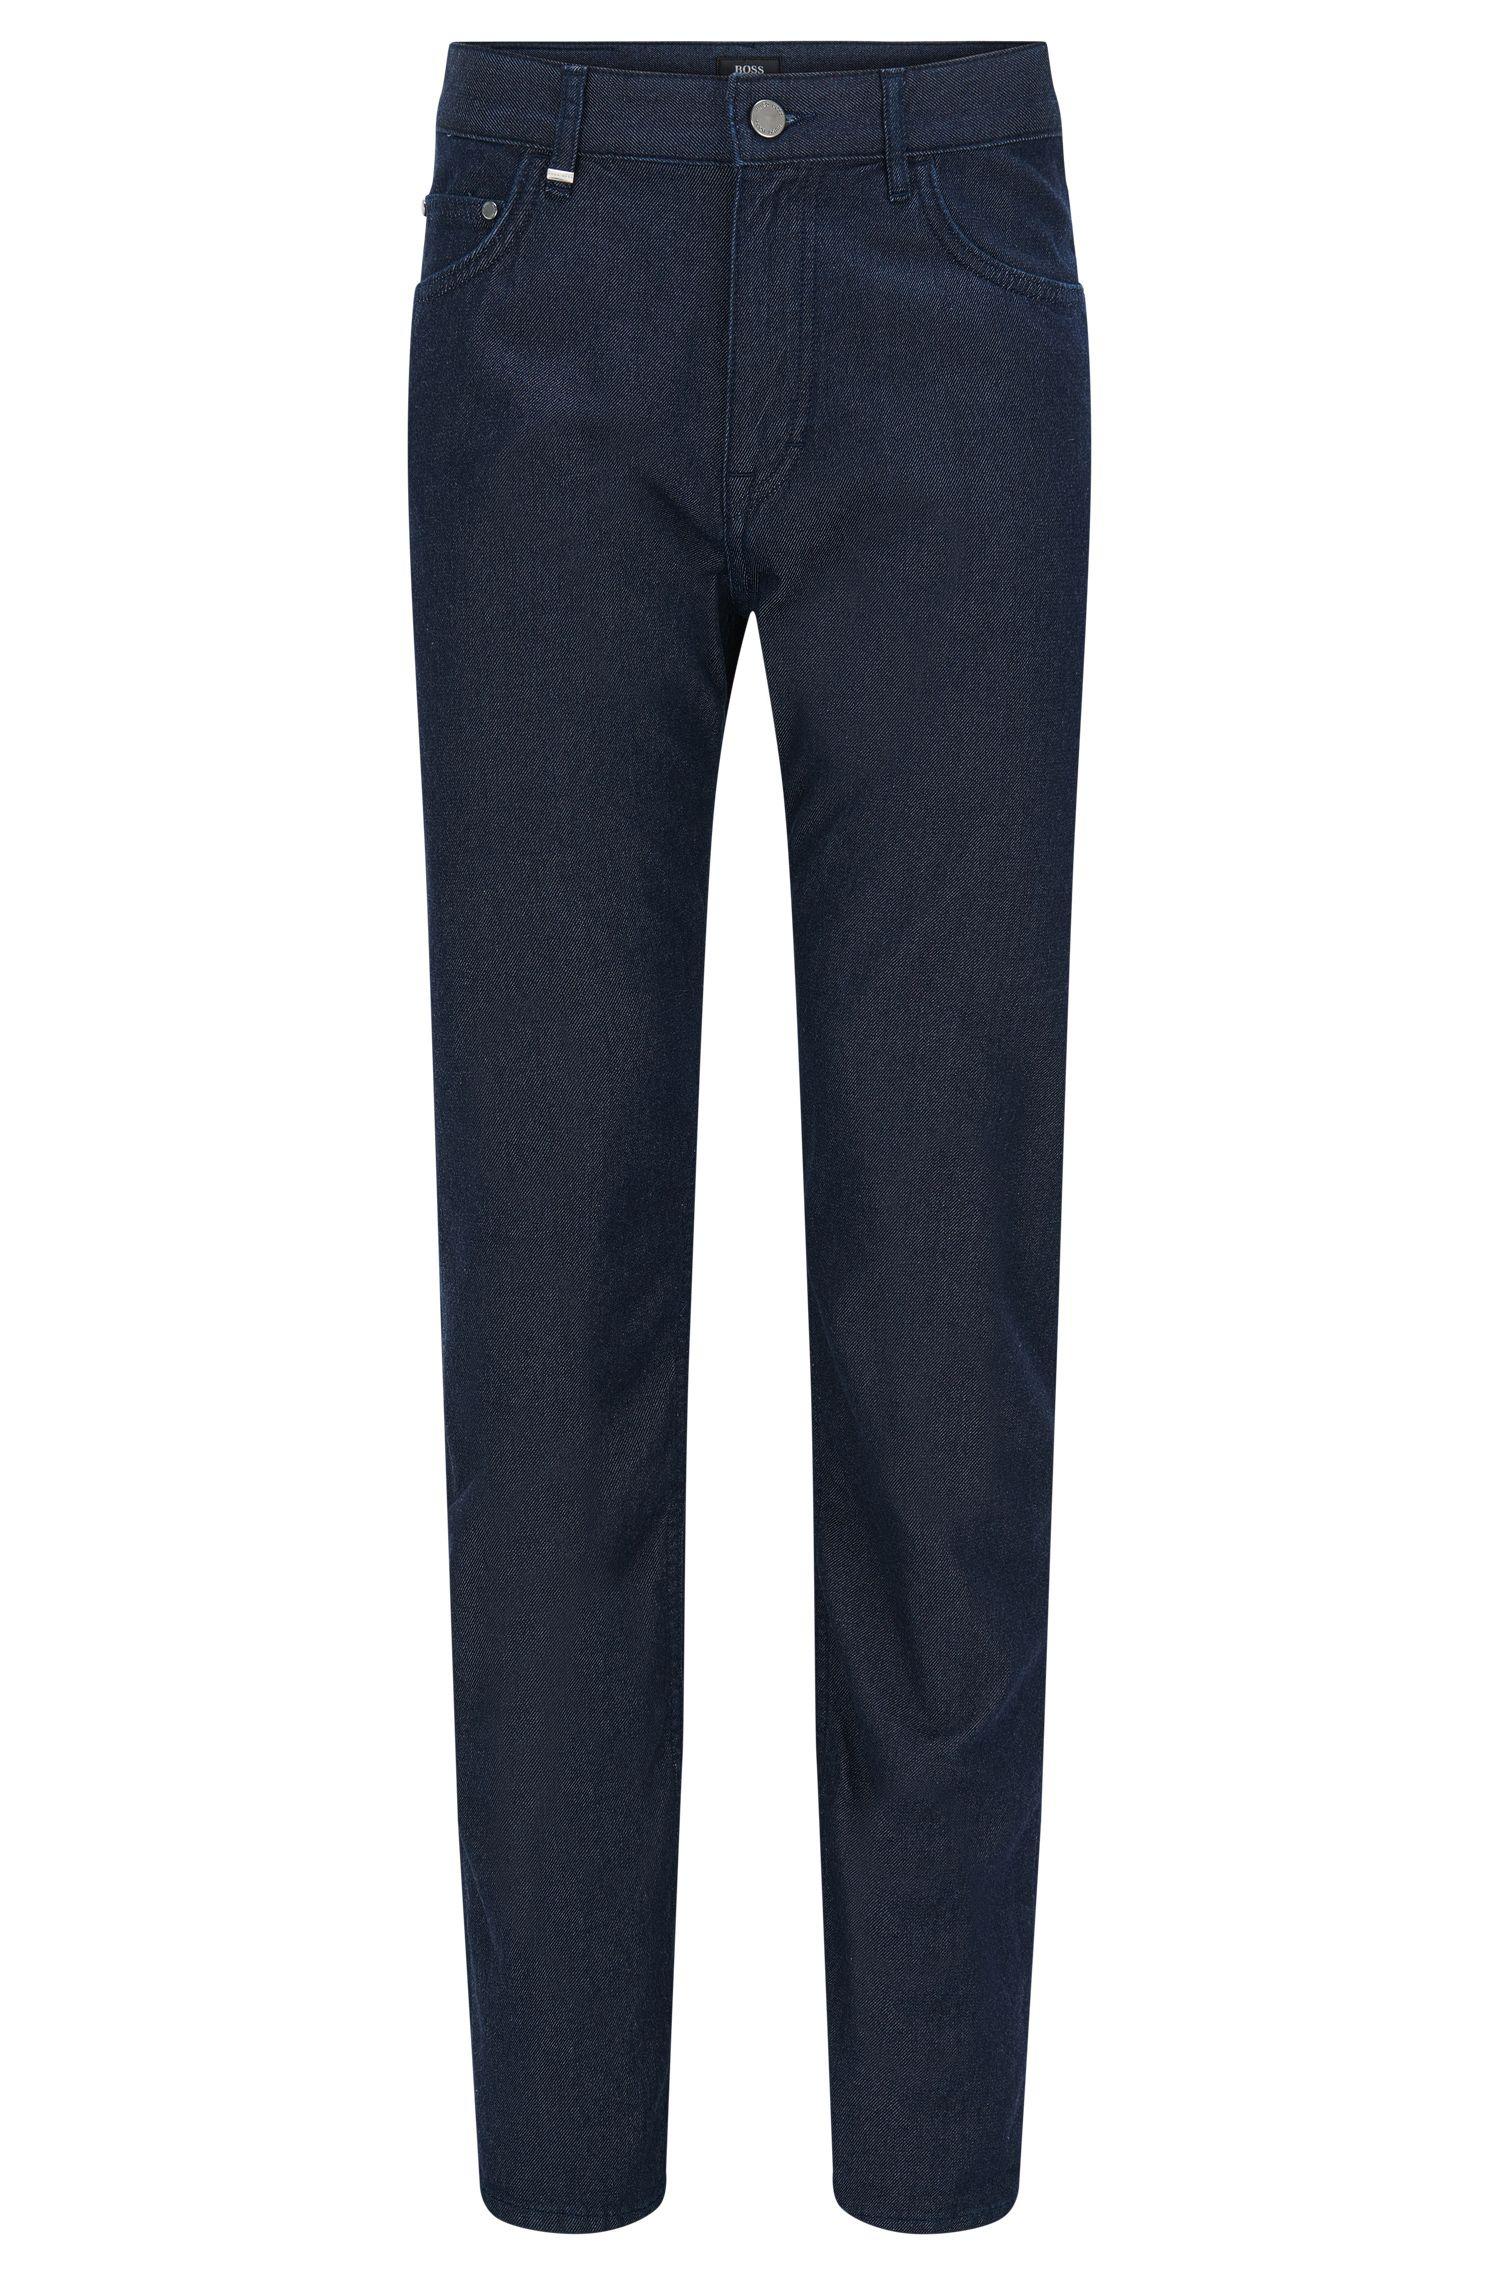 'Albany' | Comfort Fit, 9.5 oz Cotton Cashmere Jeans